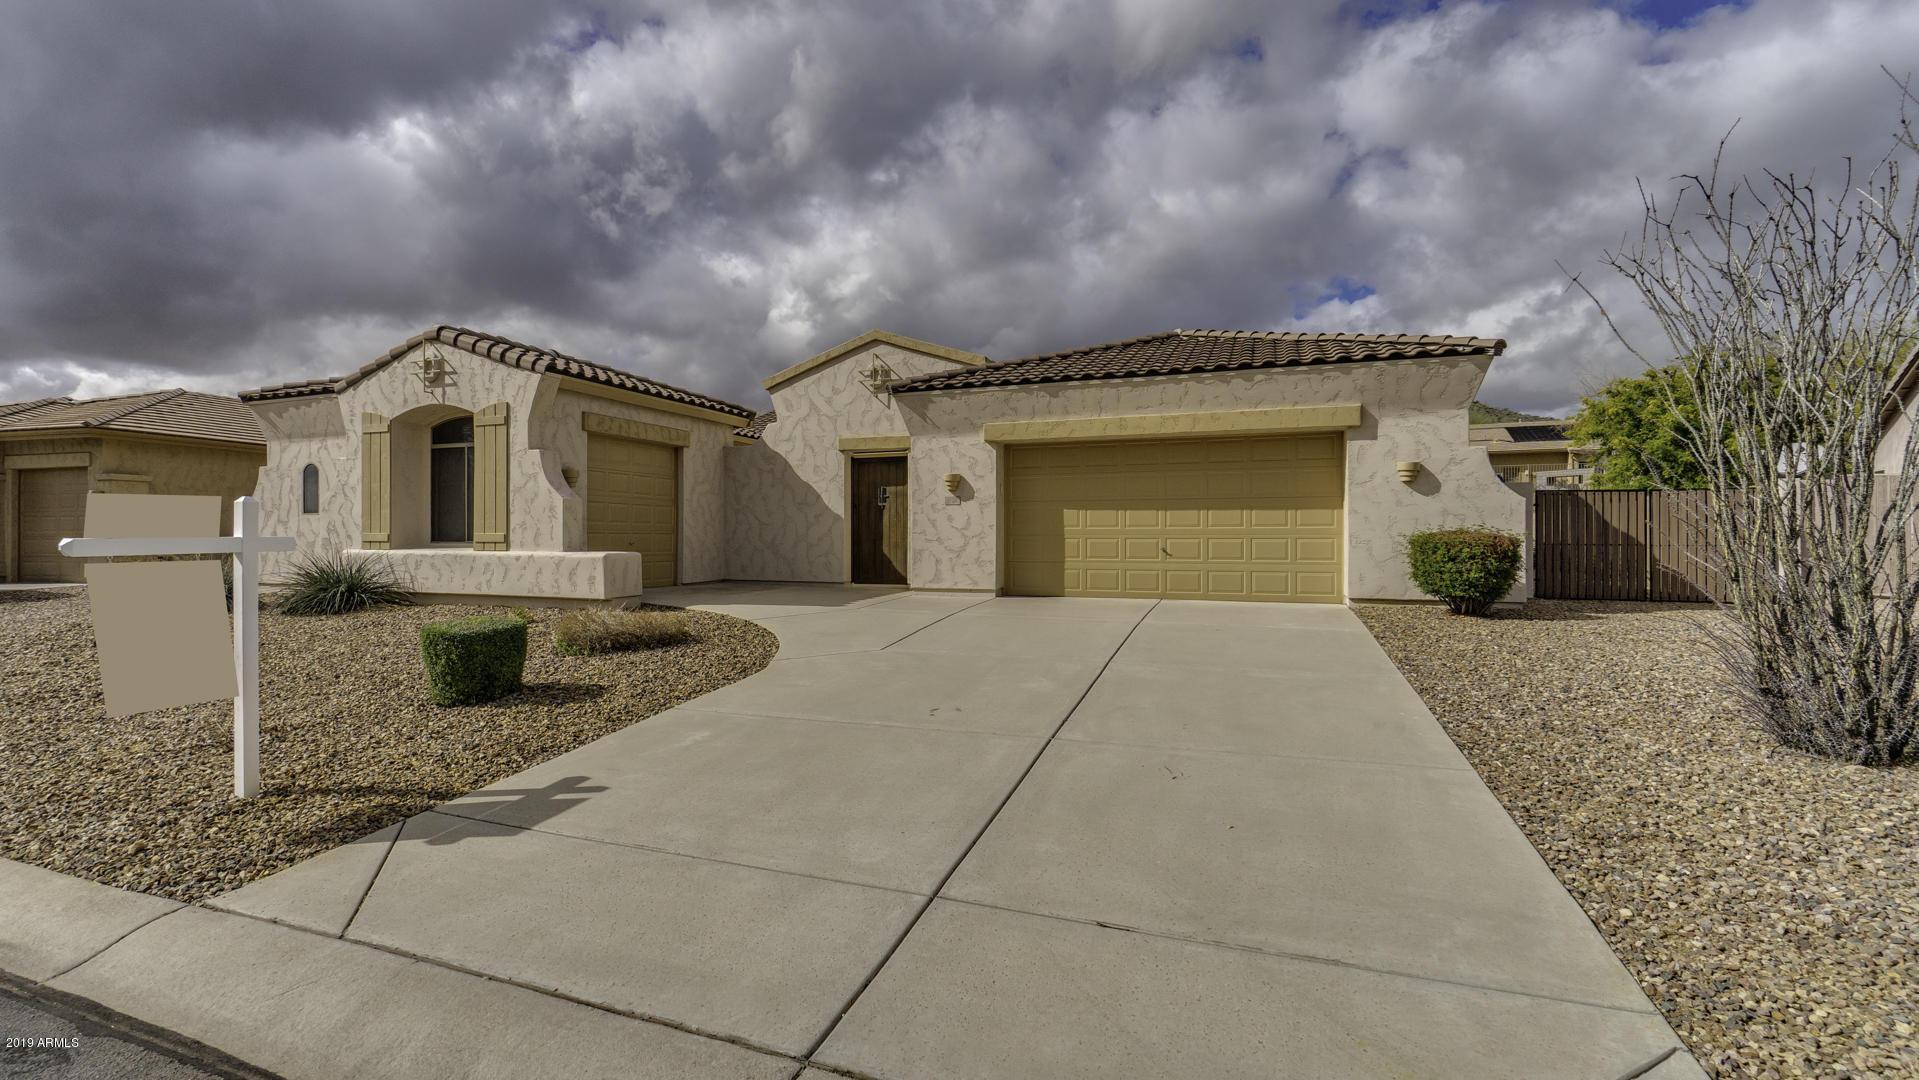 MLS 5880061 4184 S ALAMANDAS Way, Gold Canyon, AZ 85118 Gold Canyon AZ Superstition Foothills